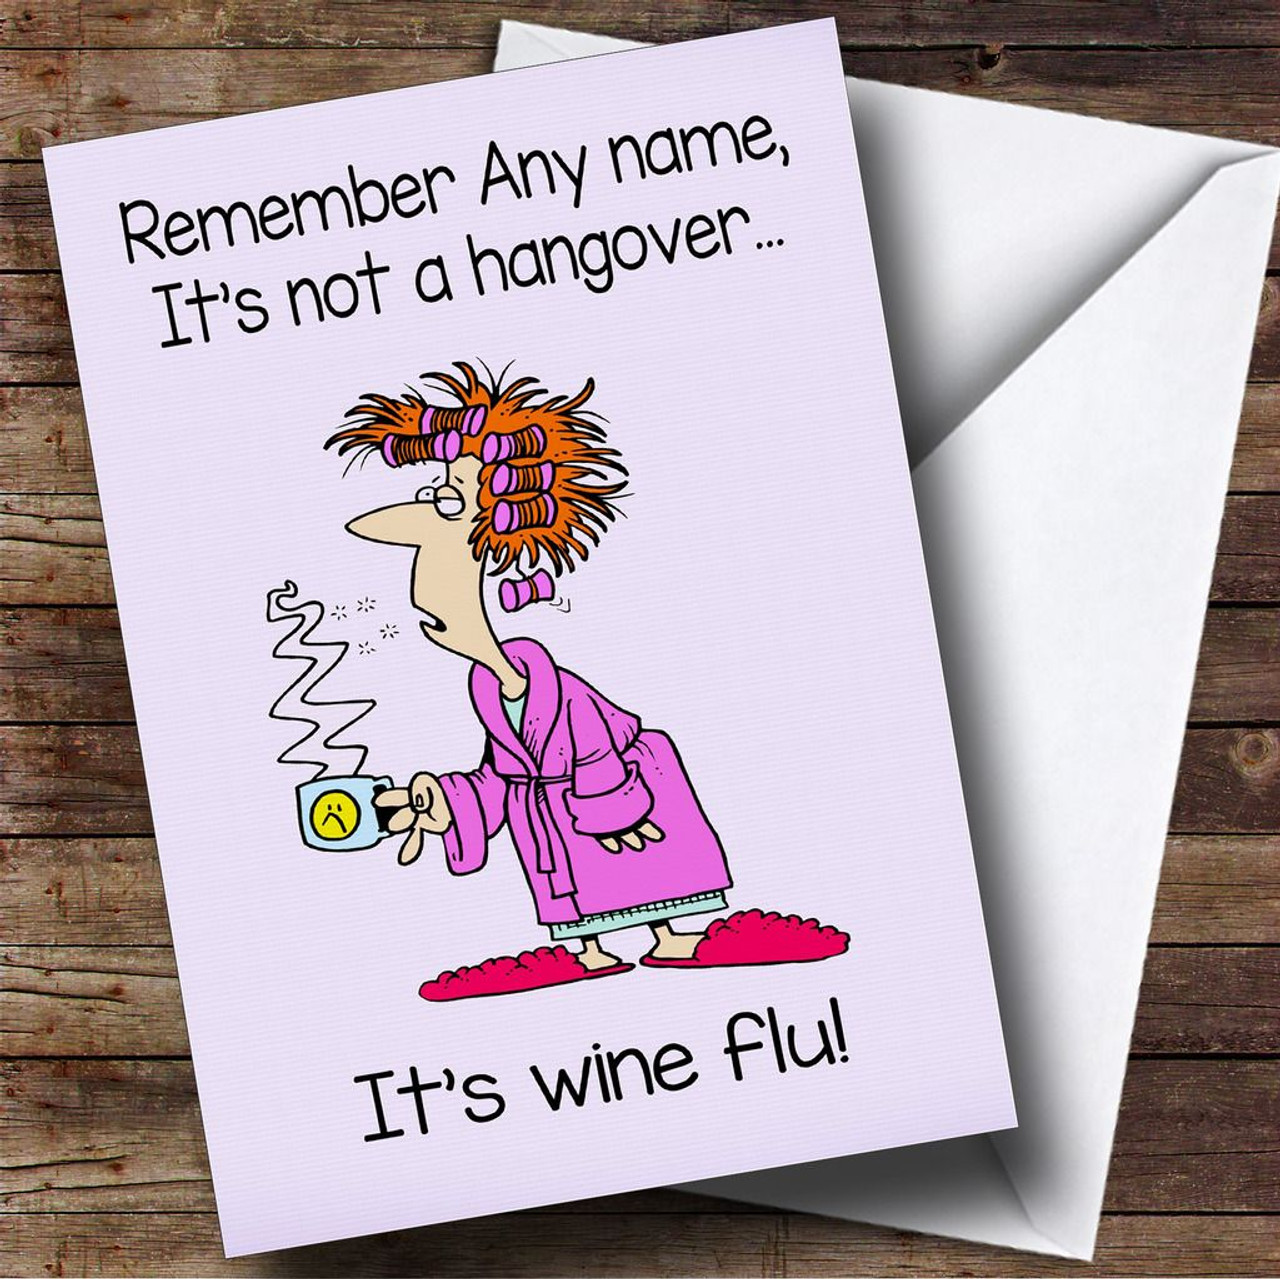 Funny Joke Retro Hangover Wine Flu Personalised Birthday Card